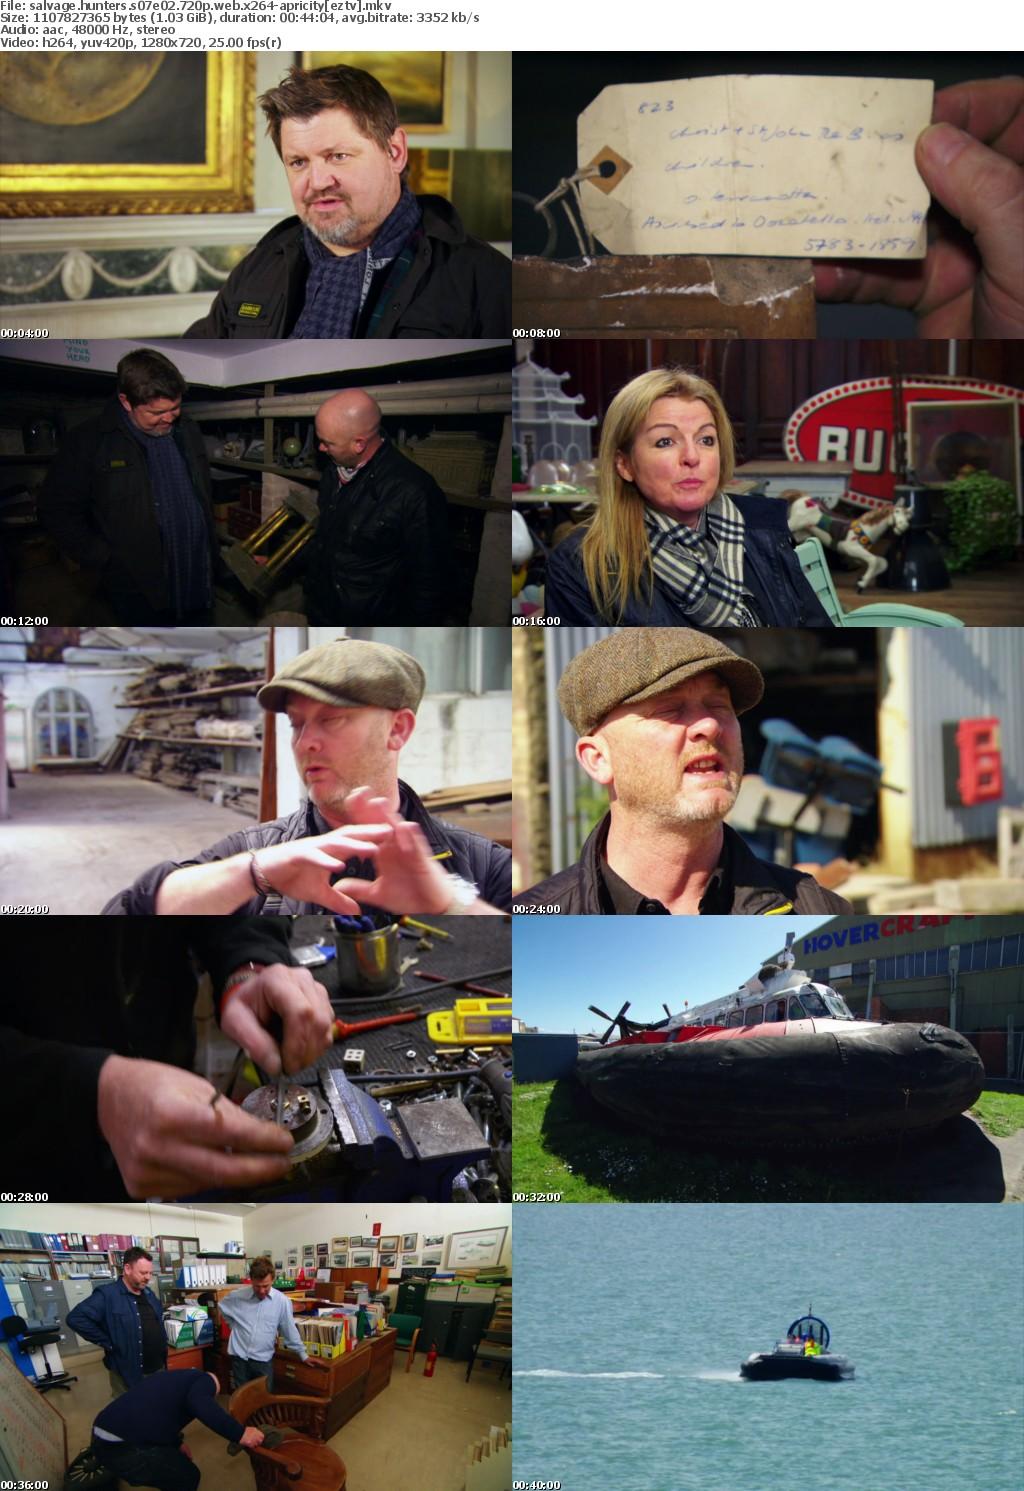 Salvage Hunters S07E02 720p WEB x264-APRiCiTY